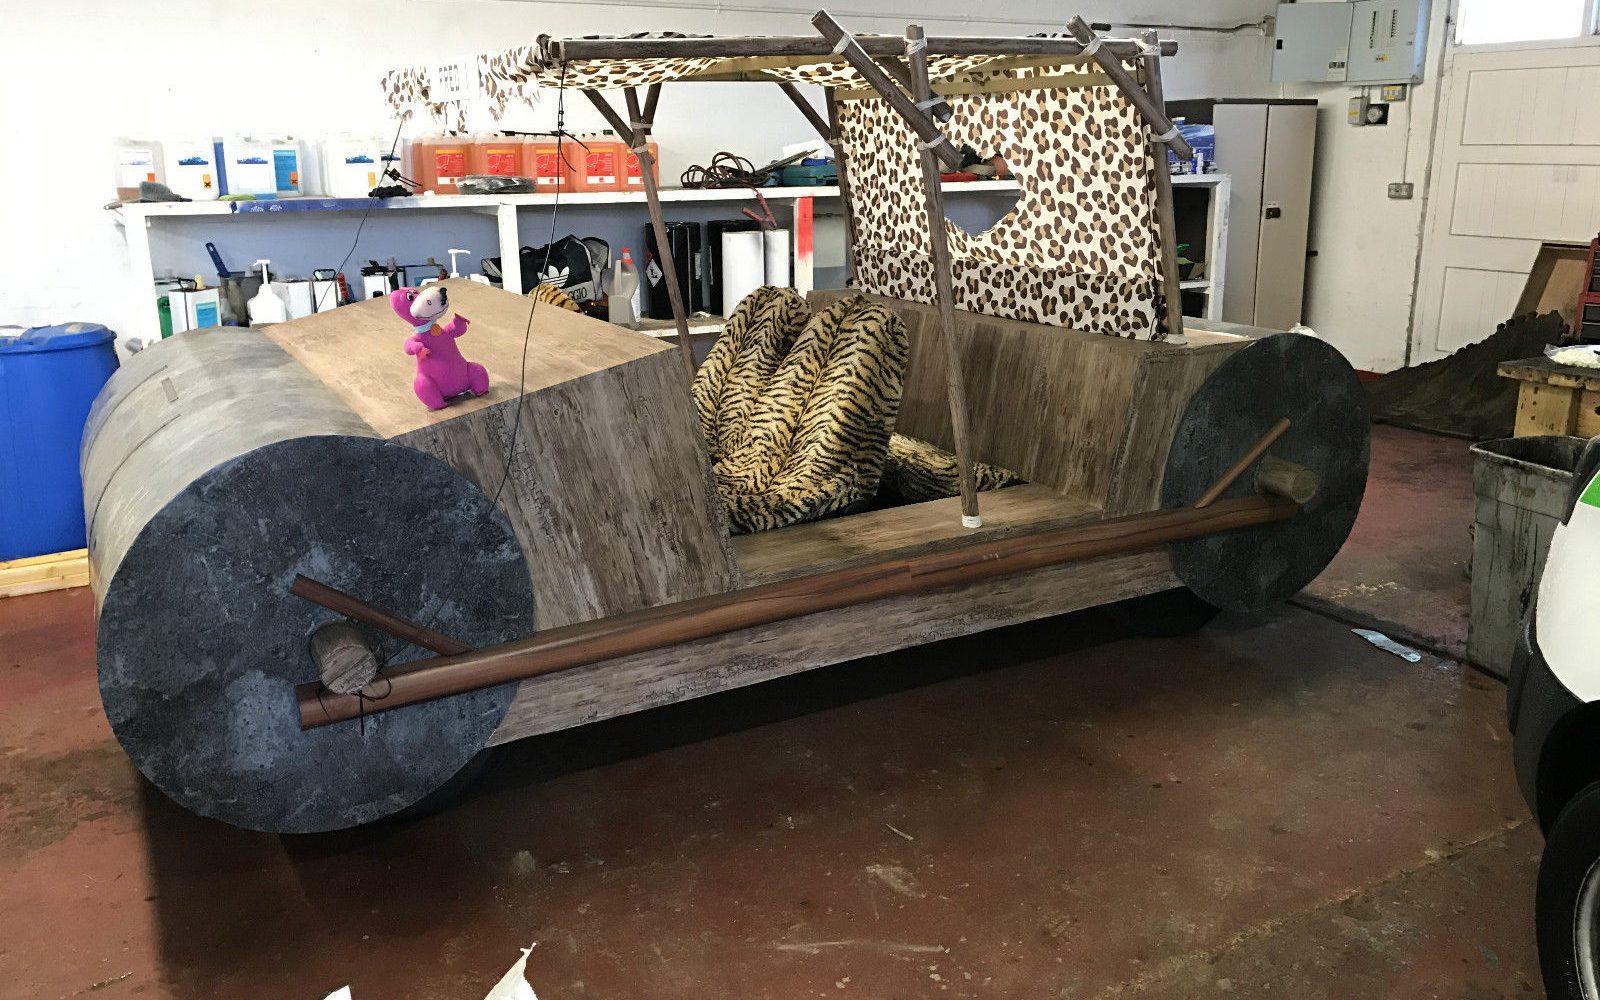 Yabba Dabba Doo Or Yabba Dabba Don't? Flintstones Replica Car For Sale On eBay